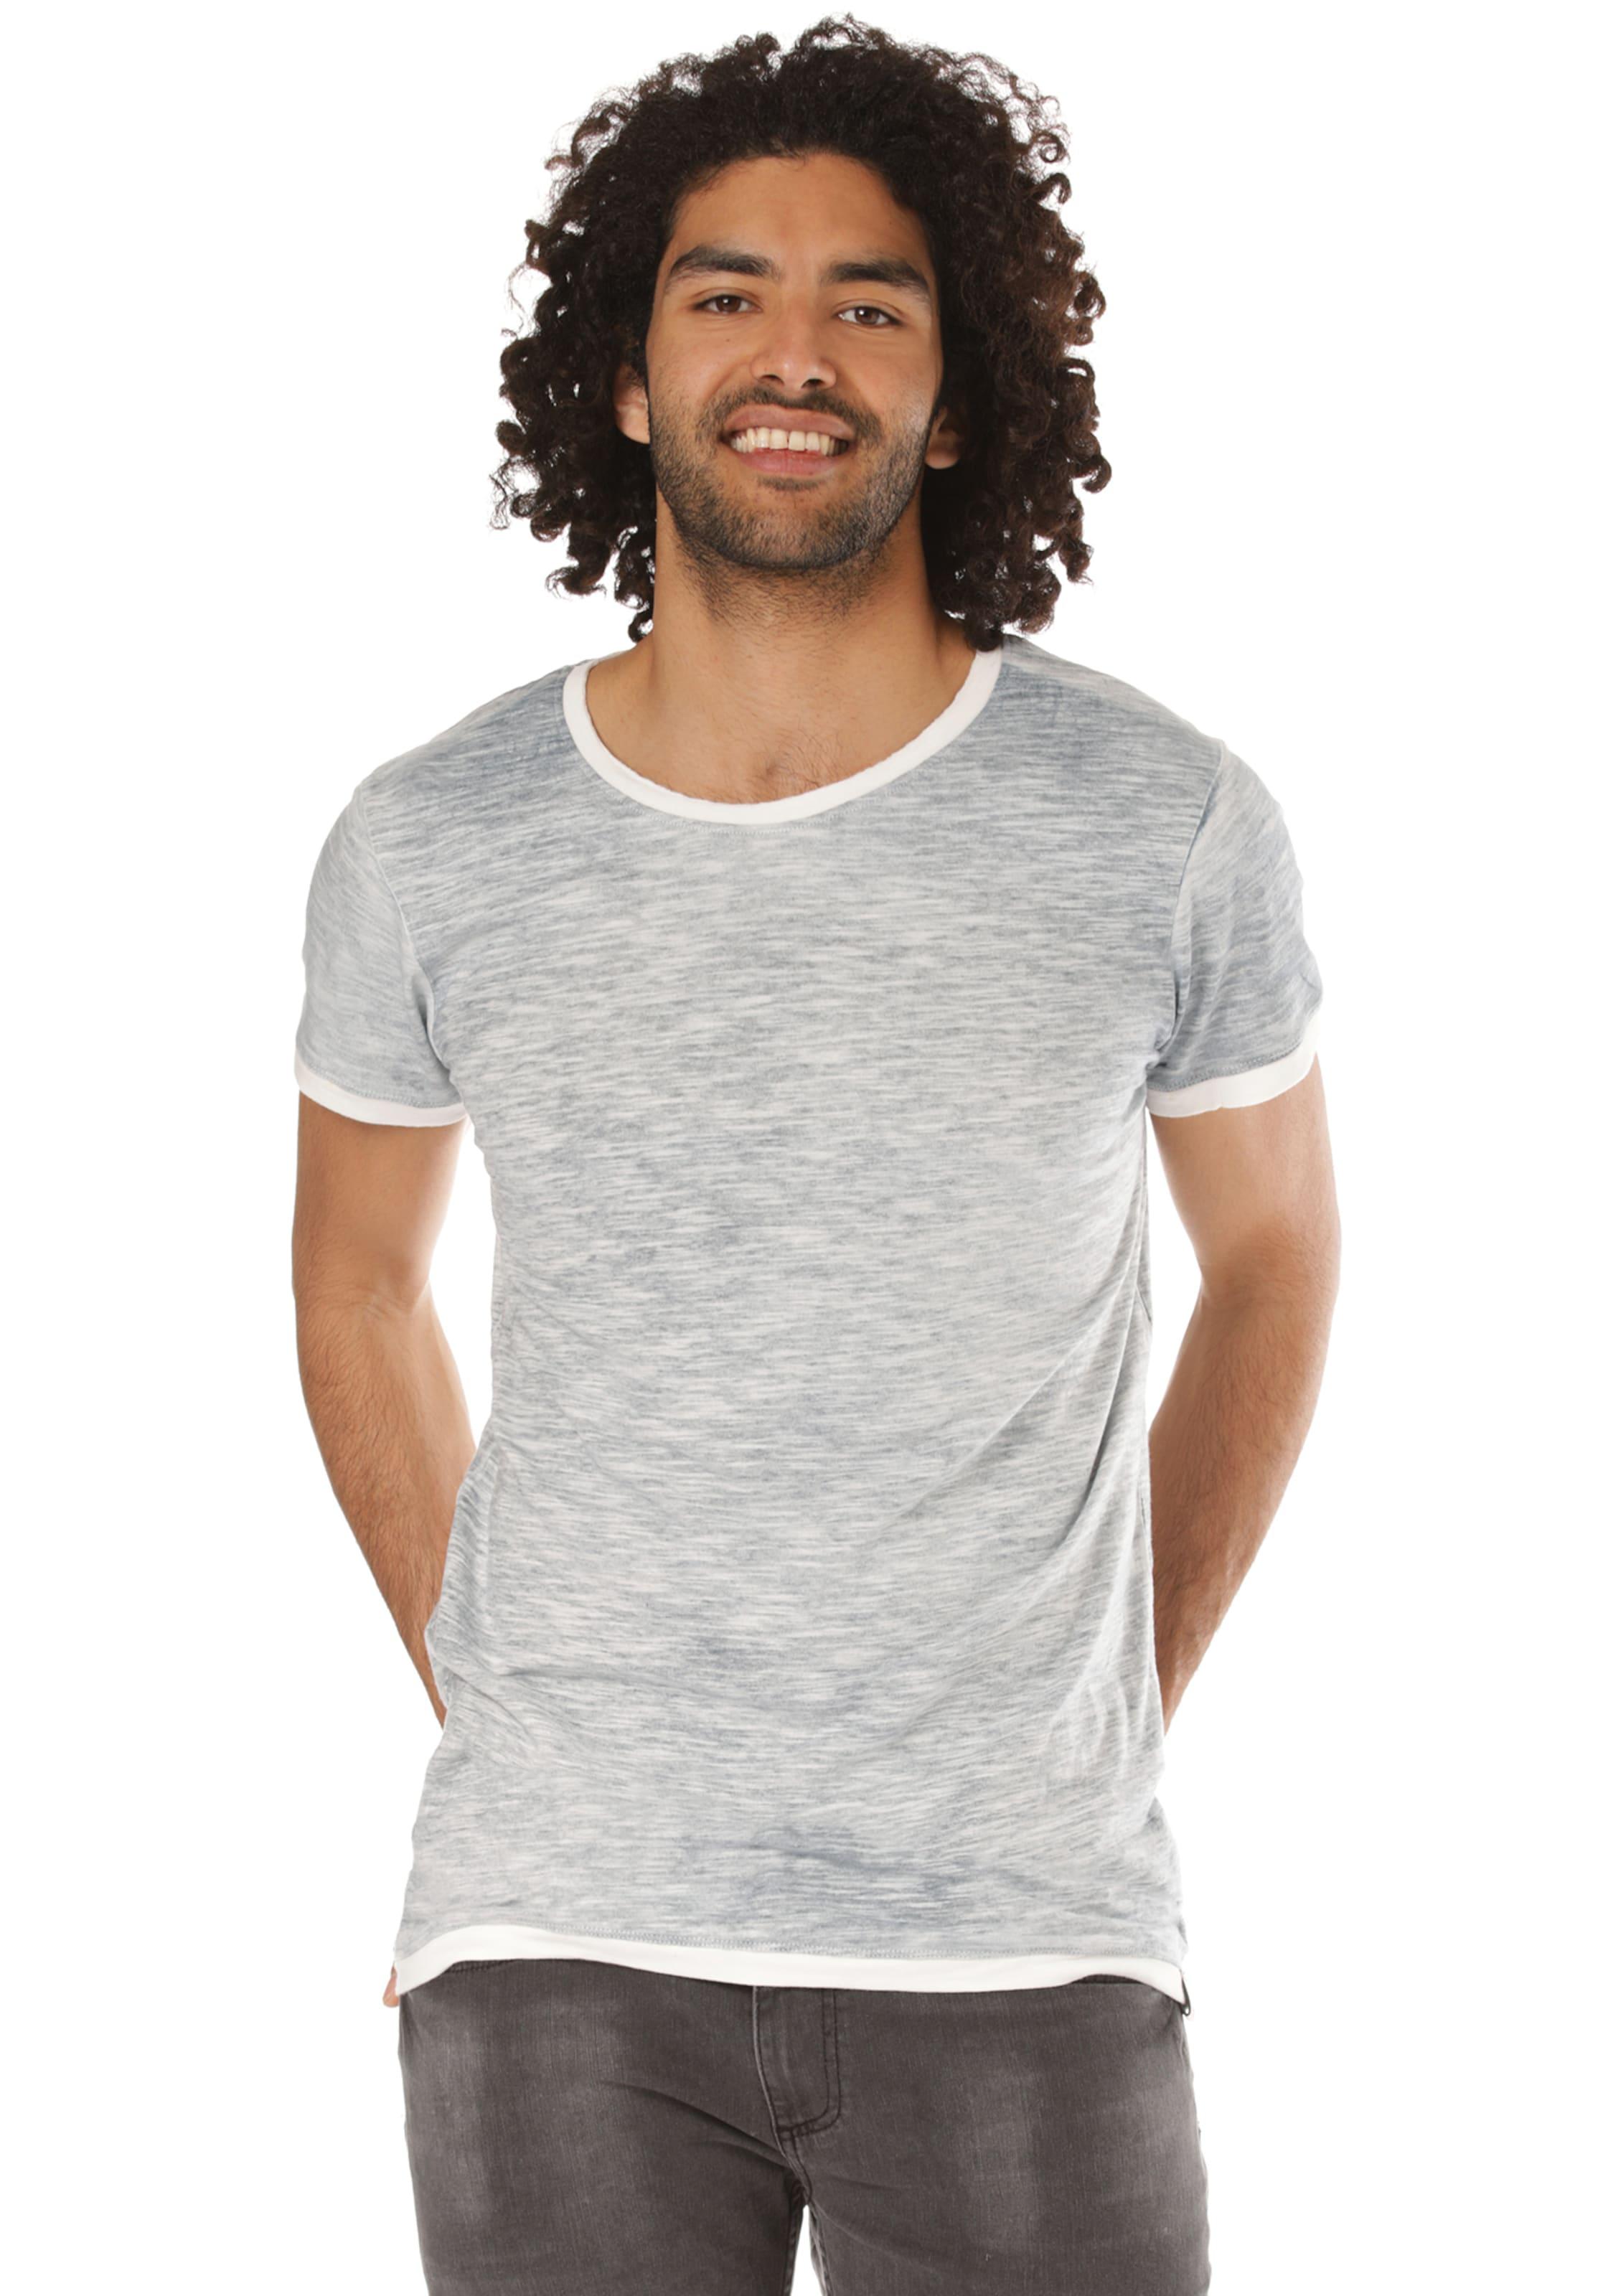 GraumeliertWeiß Lakeville Mountain T shirt 'abaja' In 7Yf6bgyv